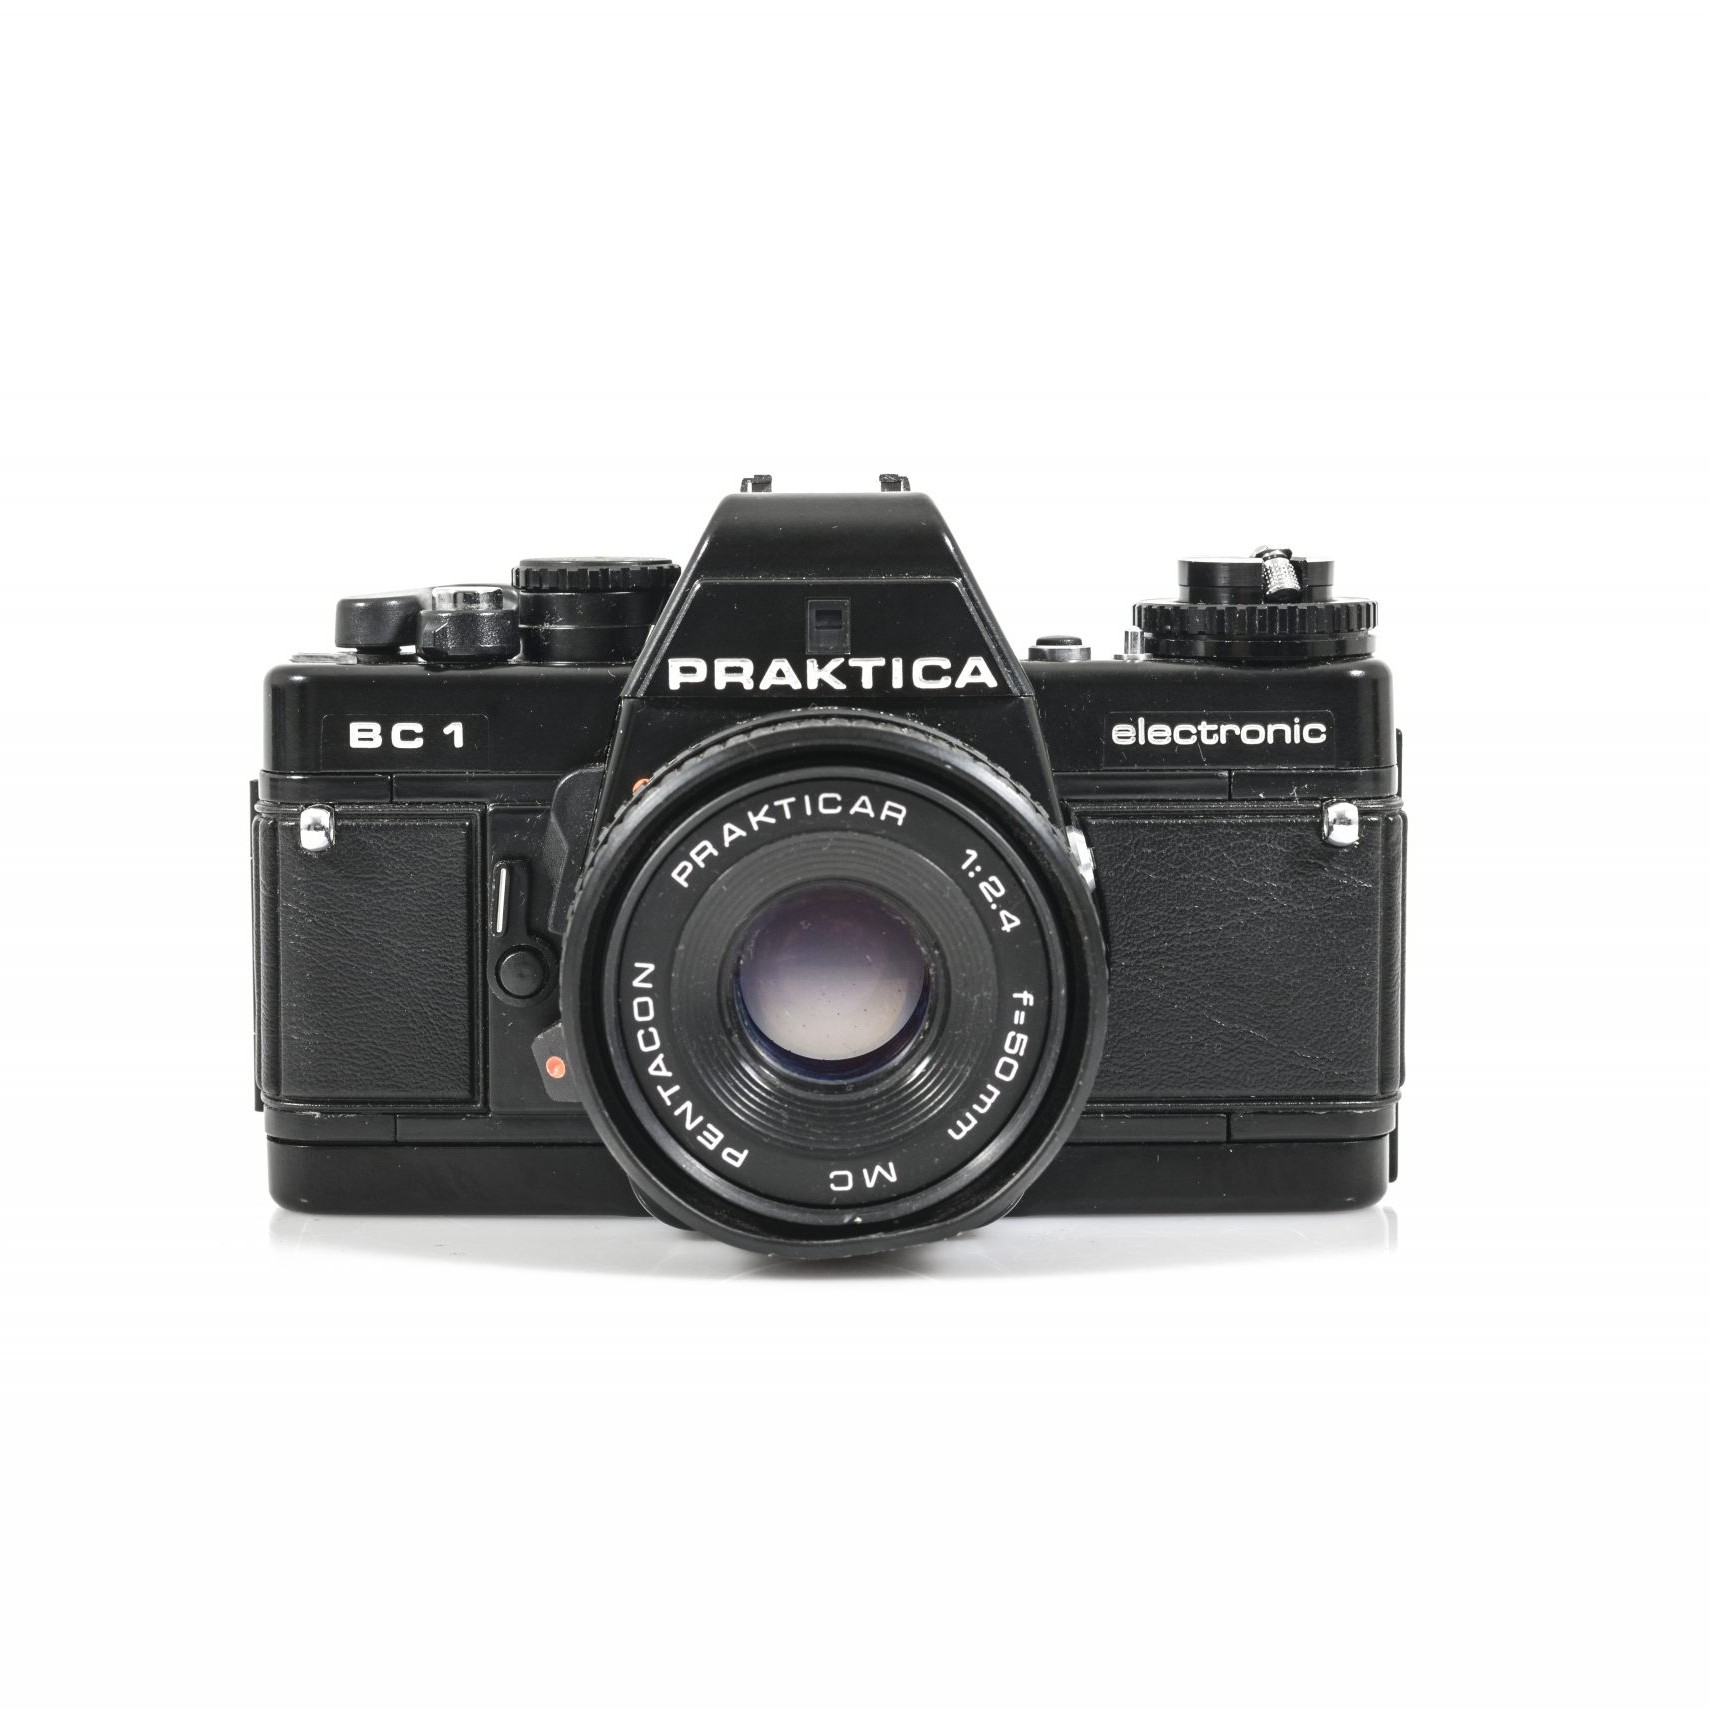 Gorgeous Praktica BC1 Electronic 35mm Film Camera + Prakticar F2.4 50mm Lens